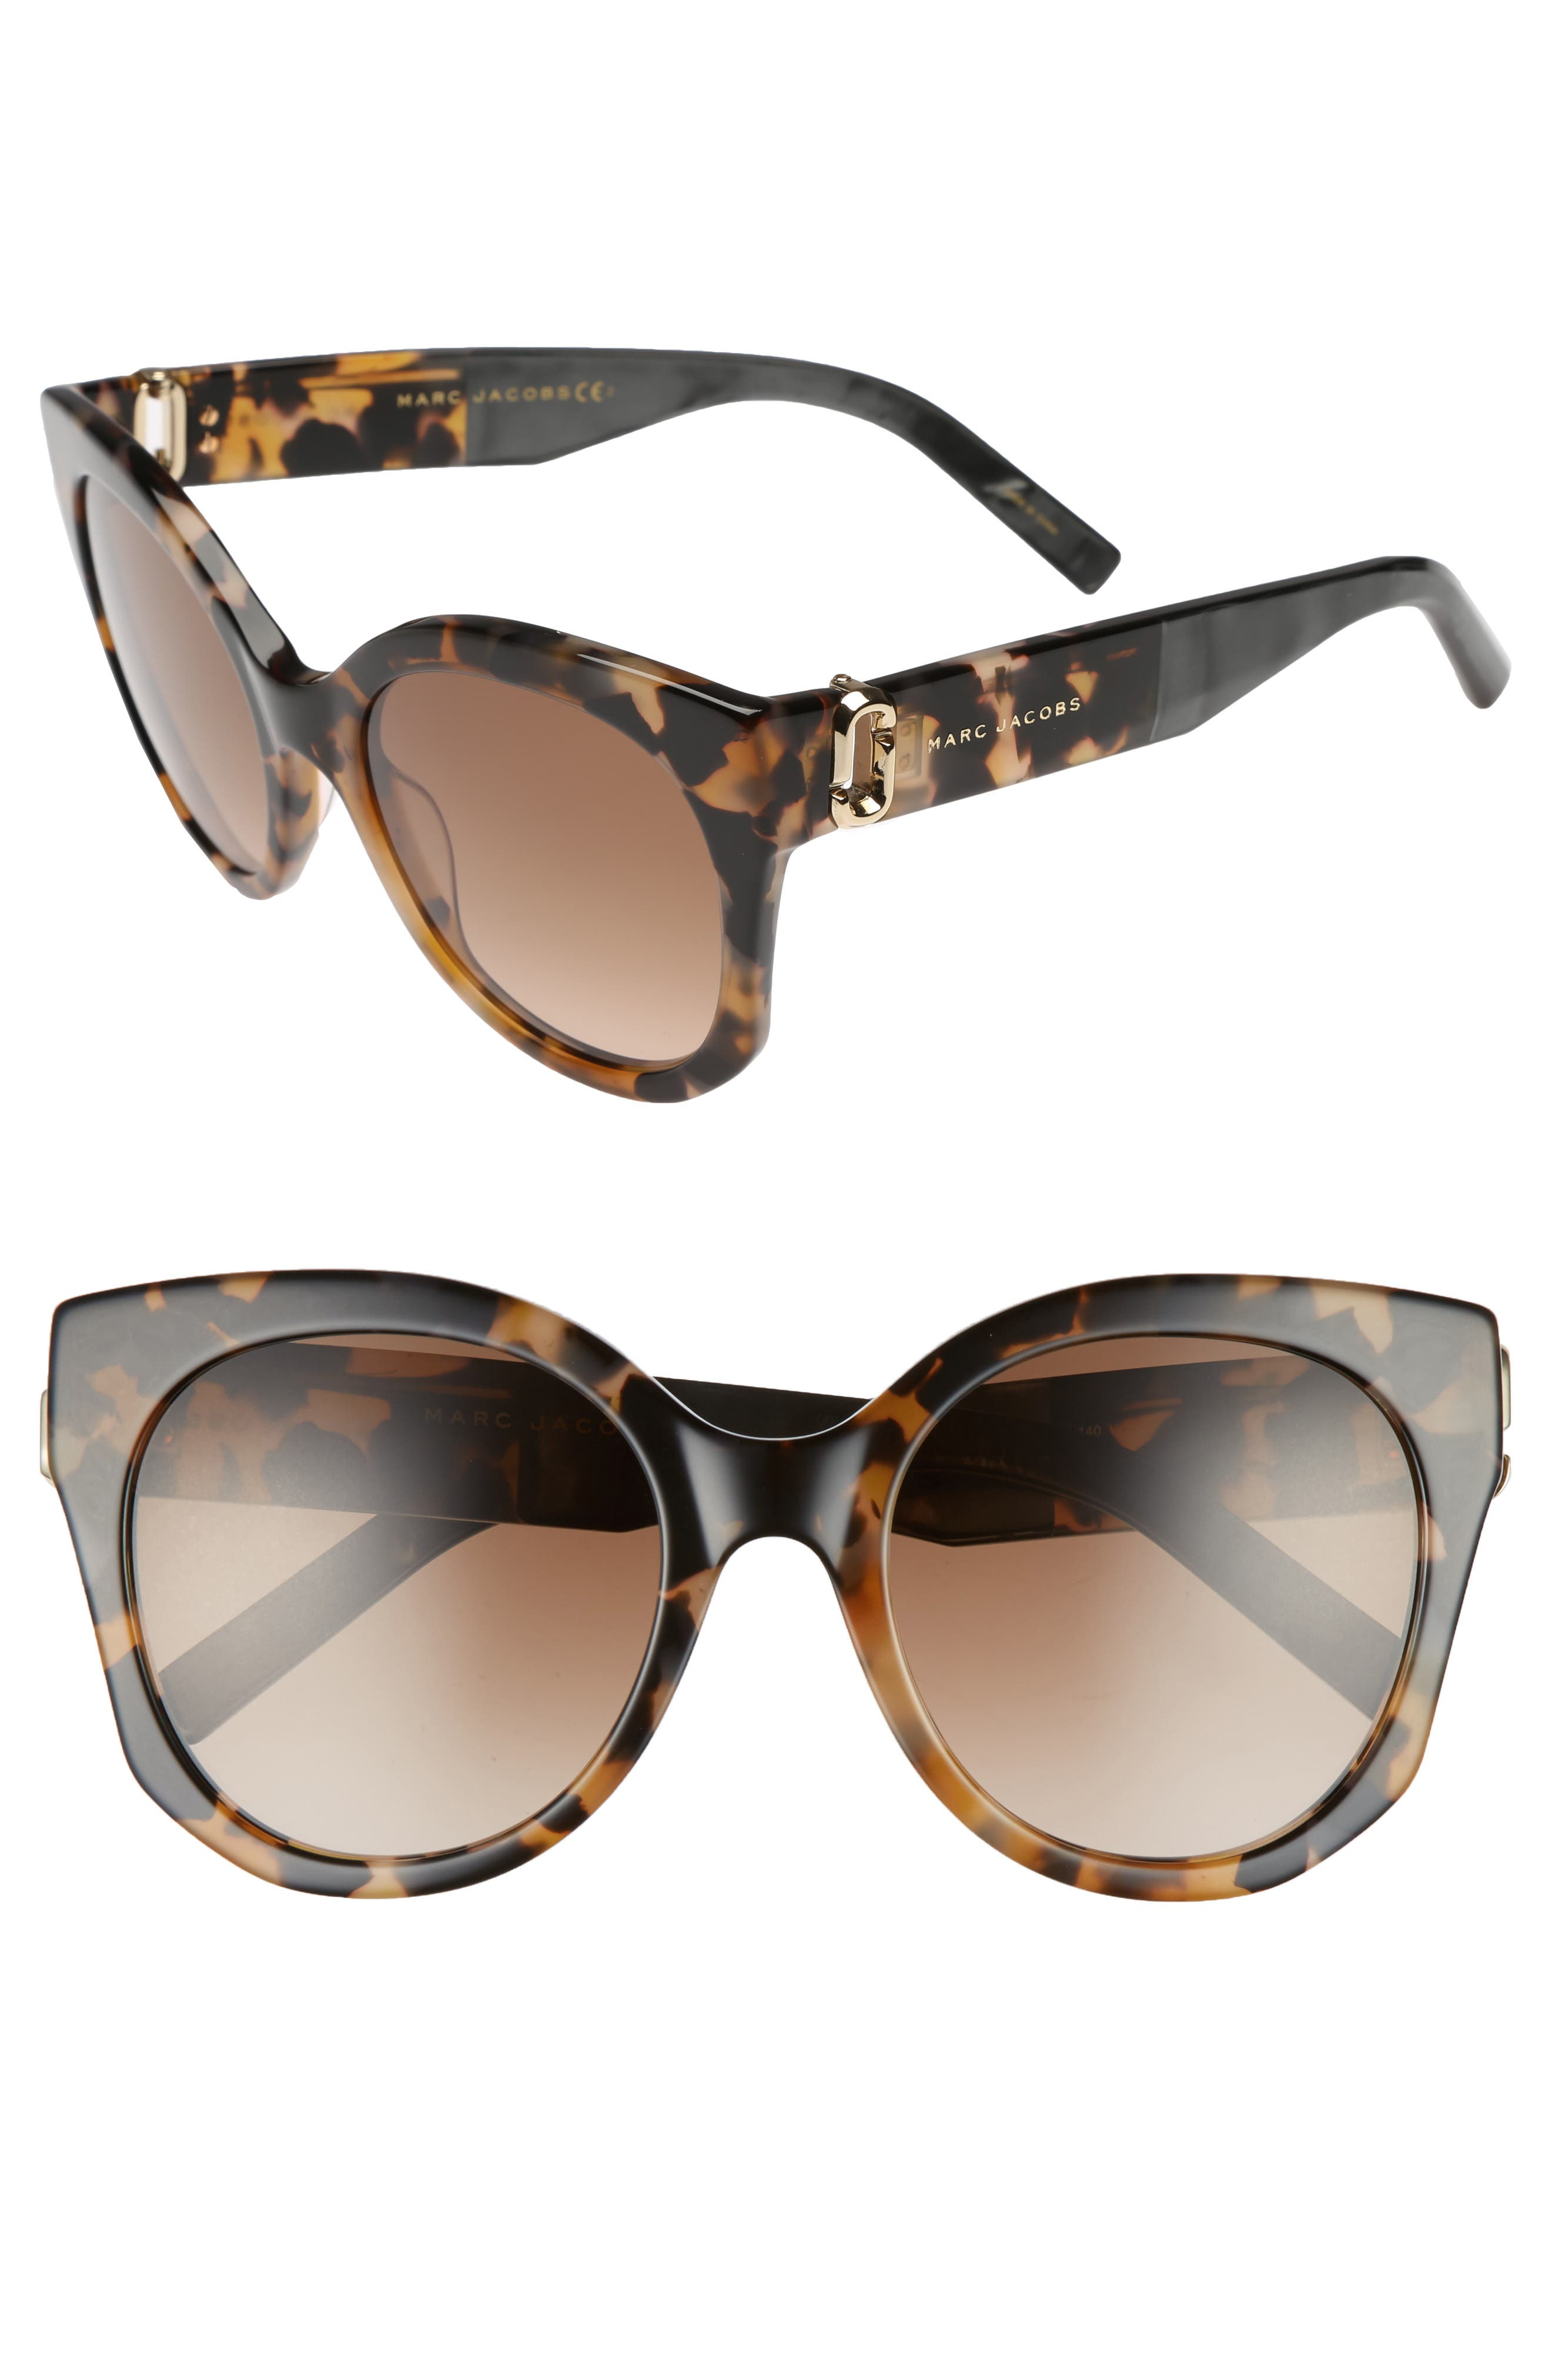 53mm Gradient Lens Cat Eye Sunglasses,                             Main thumbnail 1, color,                             Dark Havanna